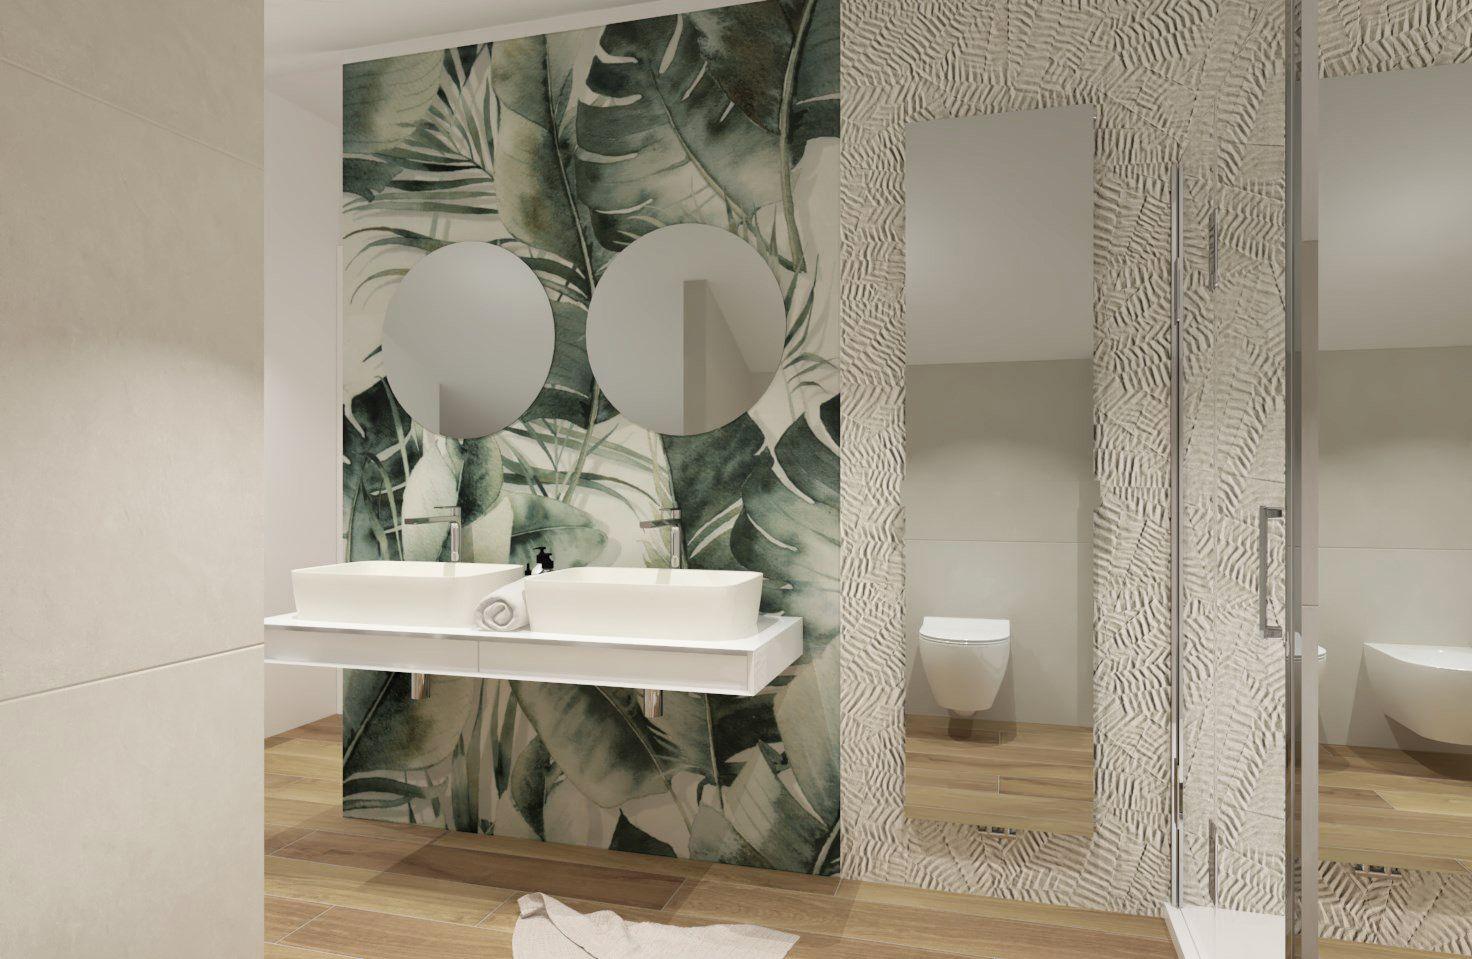 Floor Tiles Fapnest Natural Matt 20x120 In 2020 Wood Effect Porcelain Tiles Flooring Contemporary Interior Design